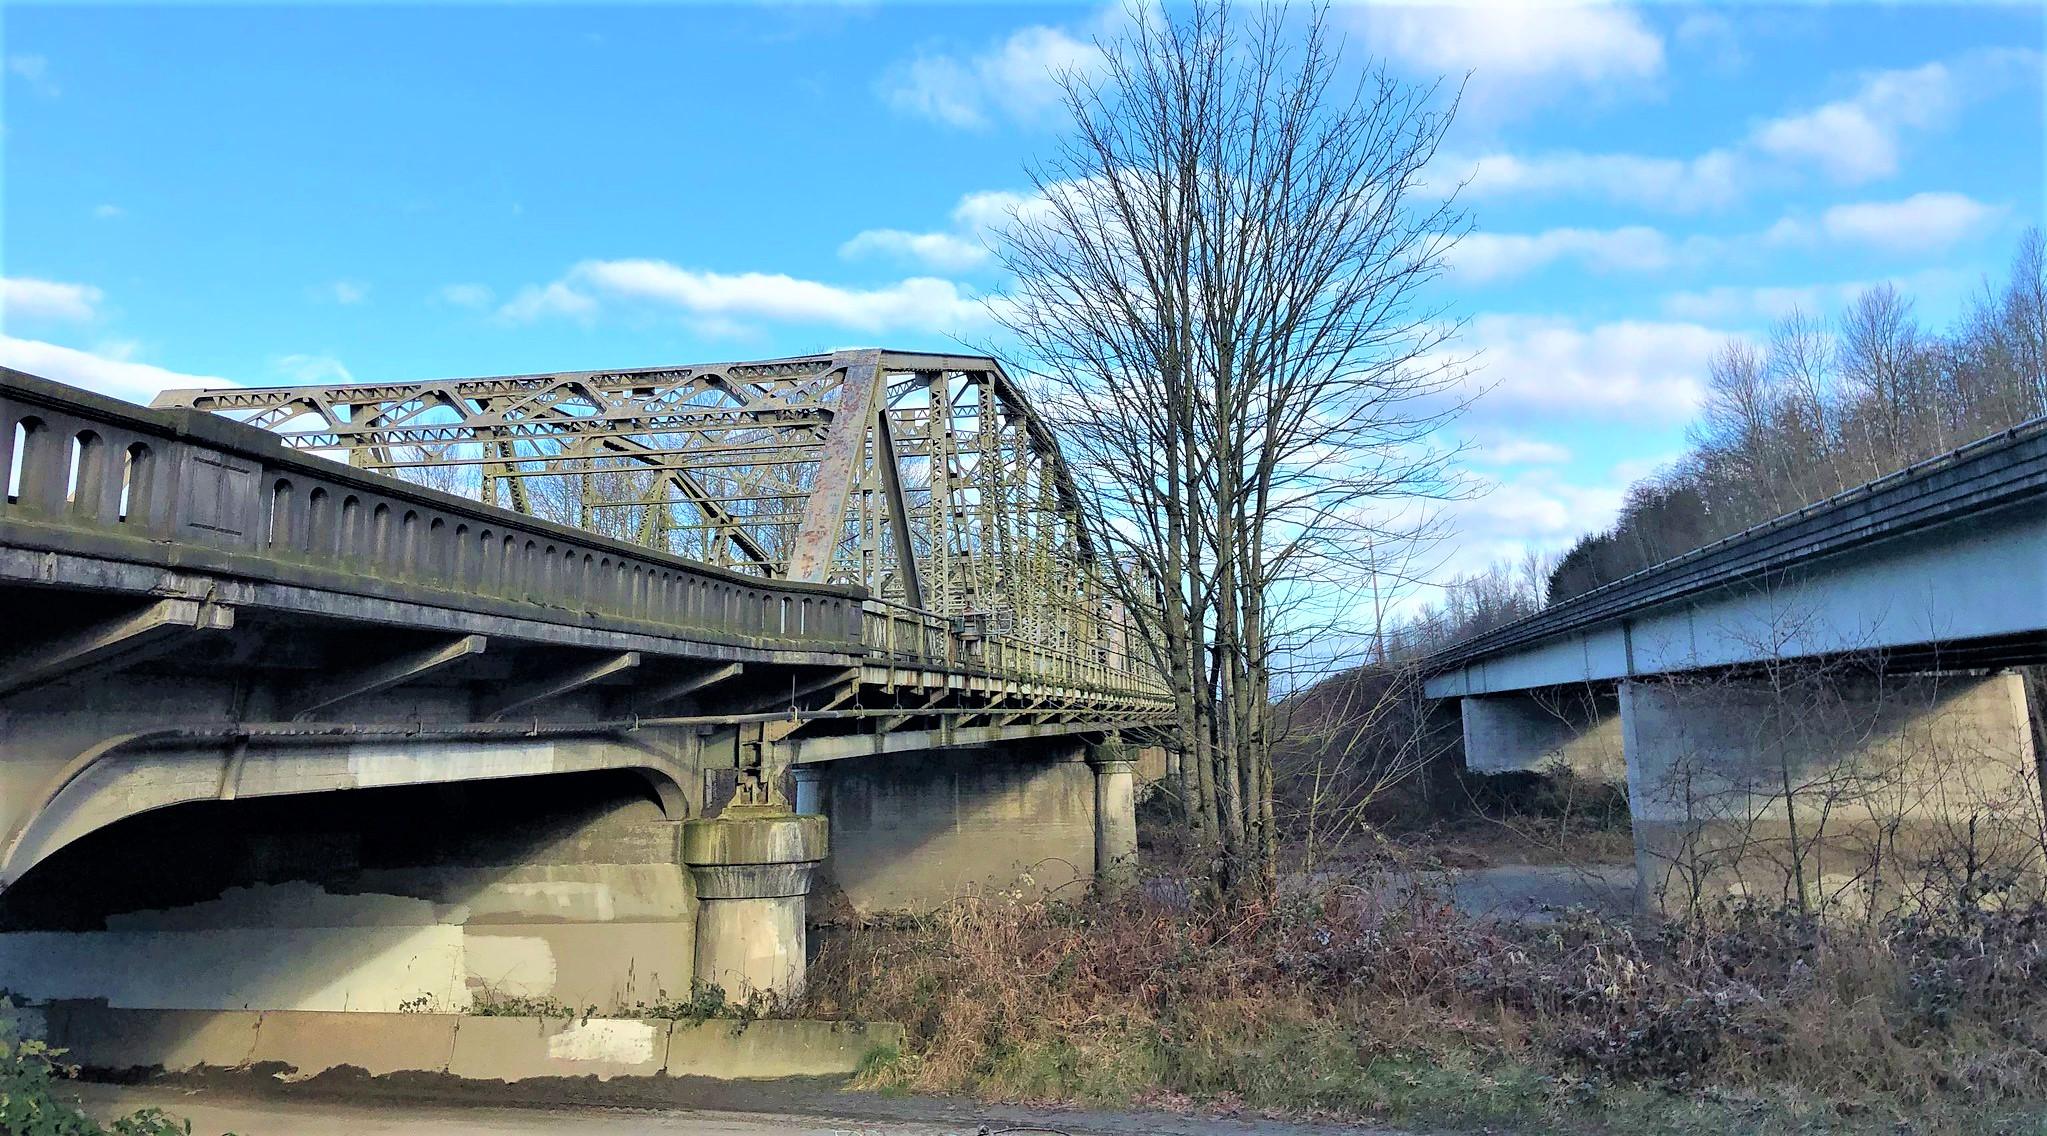 Stillaguamish Bridge (L) and the bridge carrying the northbound lanes (R) (February 10, 2021). Photo: WSDOT